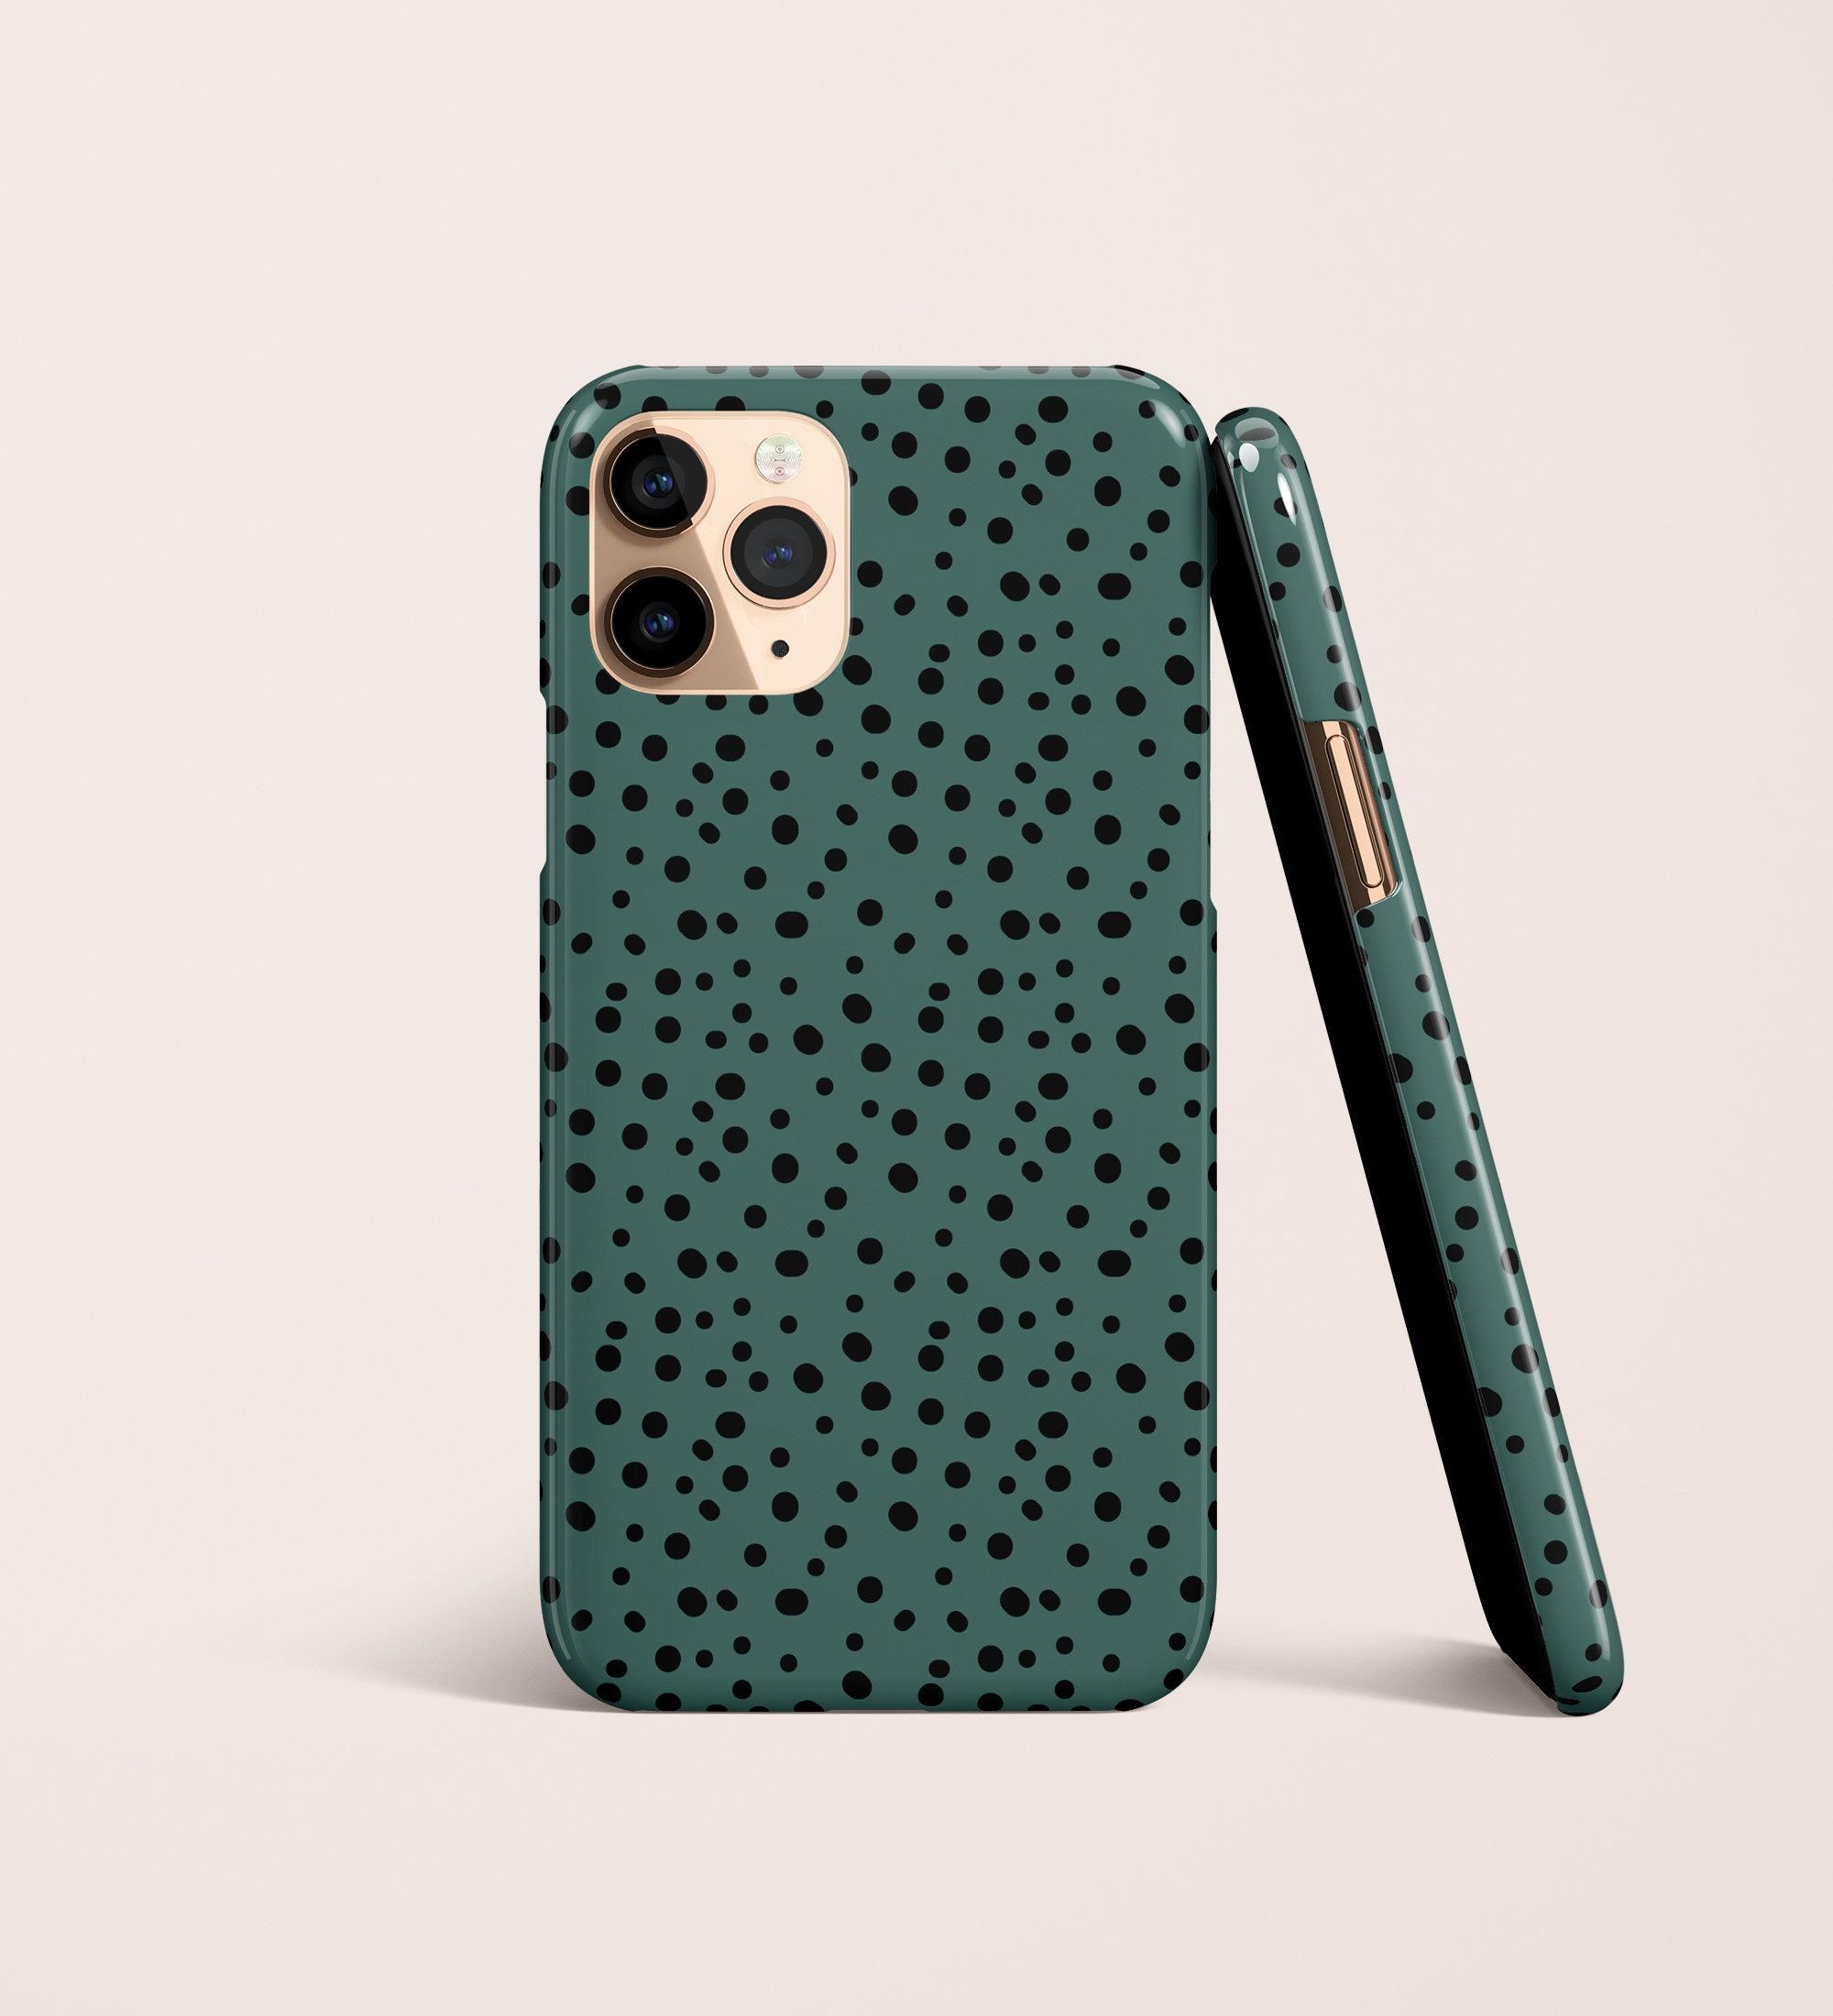 Polka Dots Green Animal Print Phone Case,iPhone 20 Pro Max 20 X 20 20 20  Samsung S20 S20 S20 S20+ S20 S20 S20 S20 Note J20 J20 A201 A201 Google Pixel